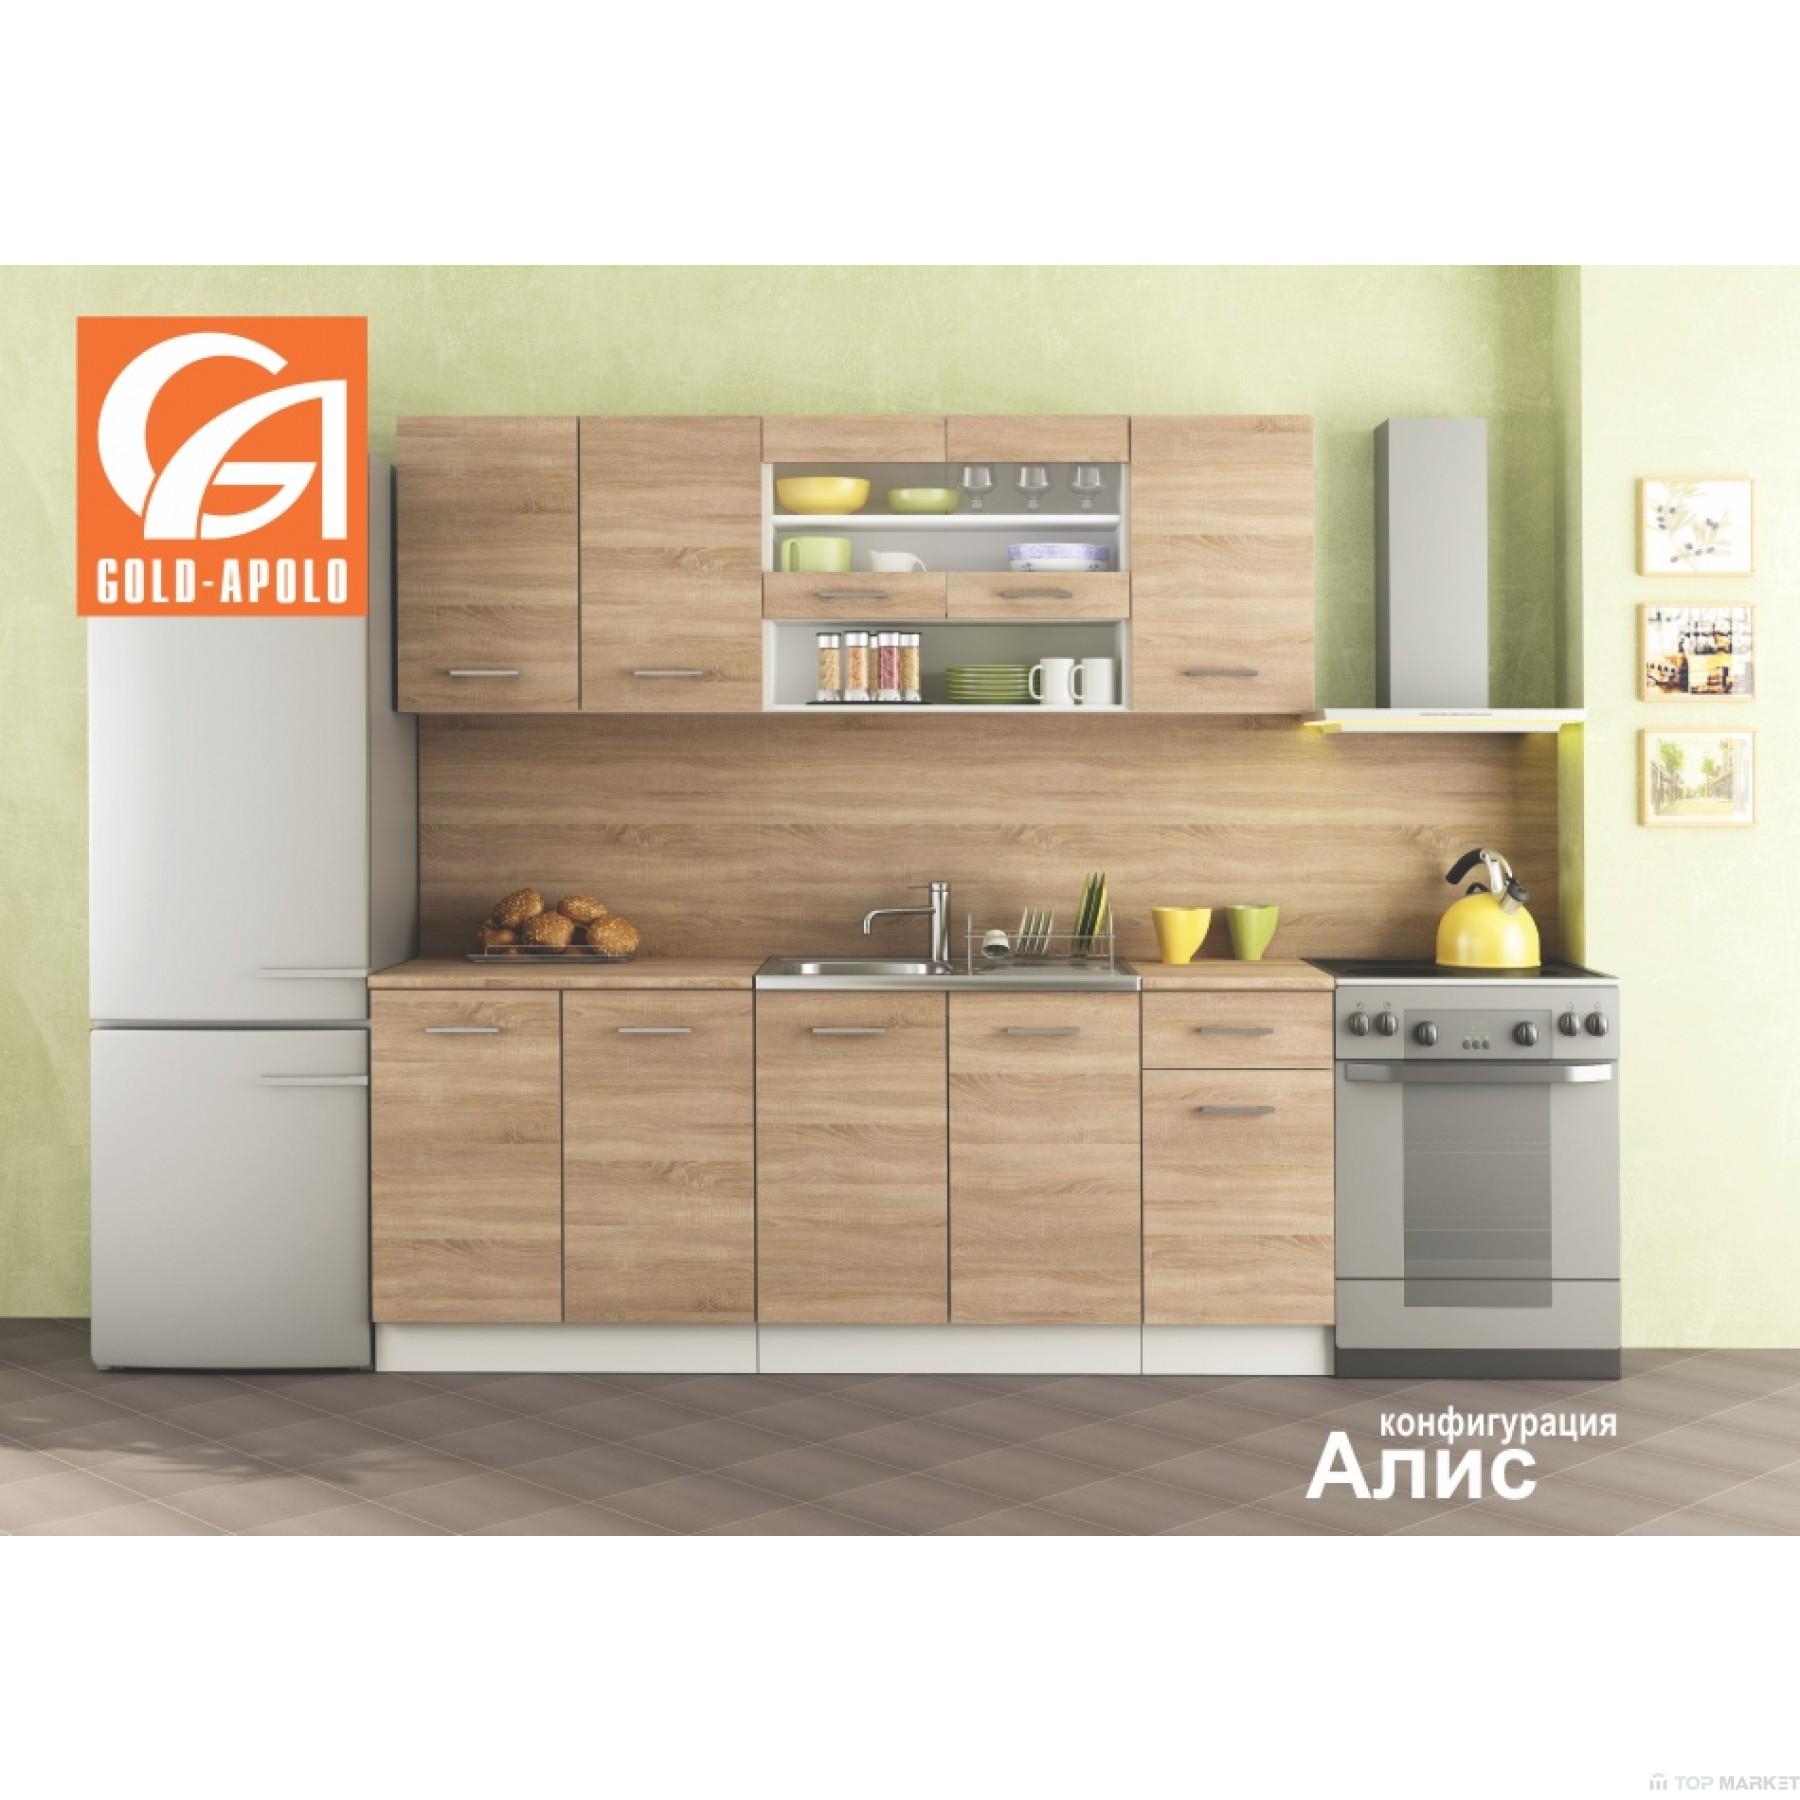 Горна етажерка за кухня АЛИС